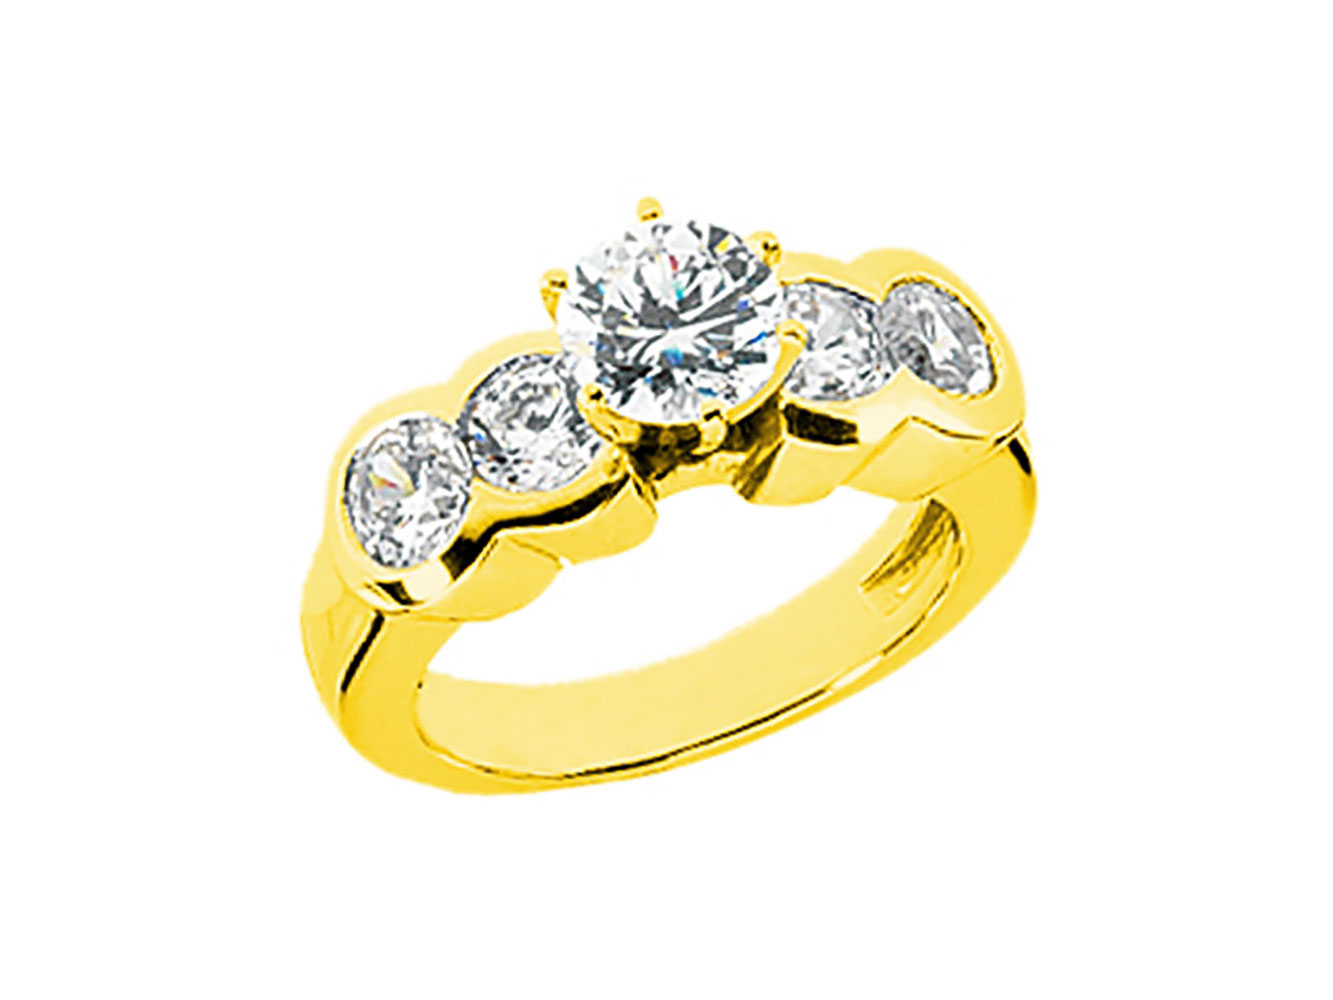 69e086e2f86ed Details about 2.00Ct Round Brilliant Diamond Engagement Ring Bezel Set  Accents 18k Gold